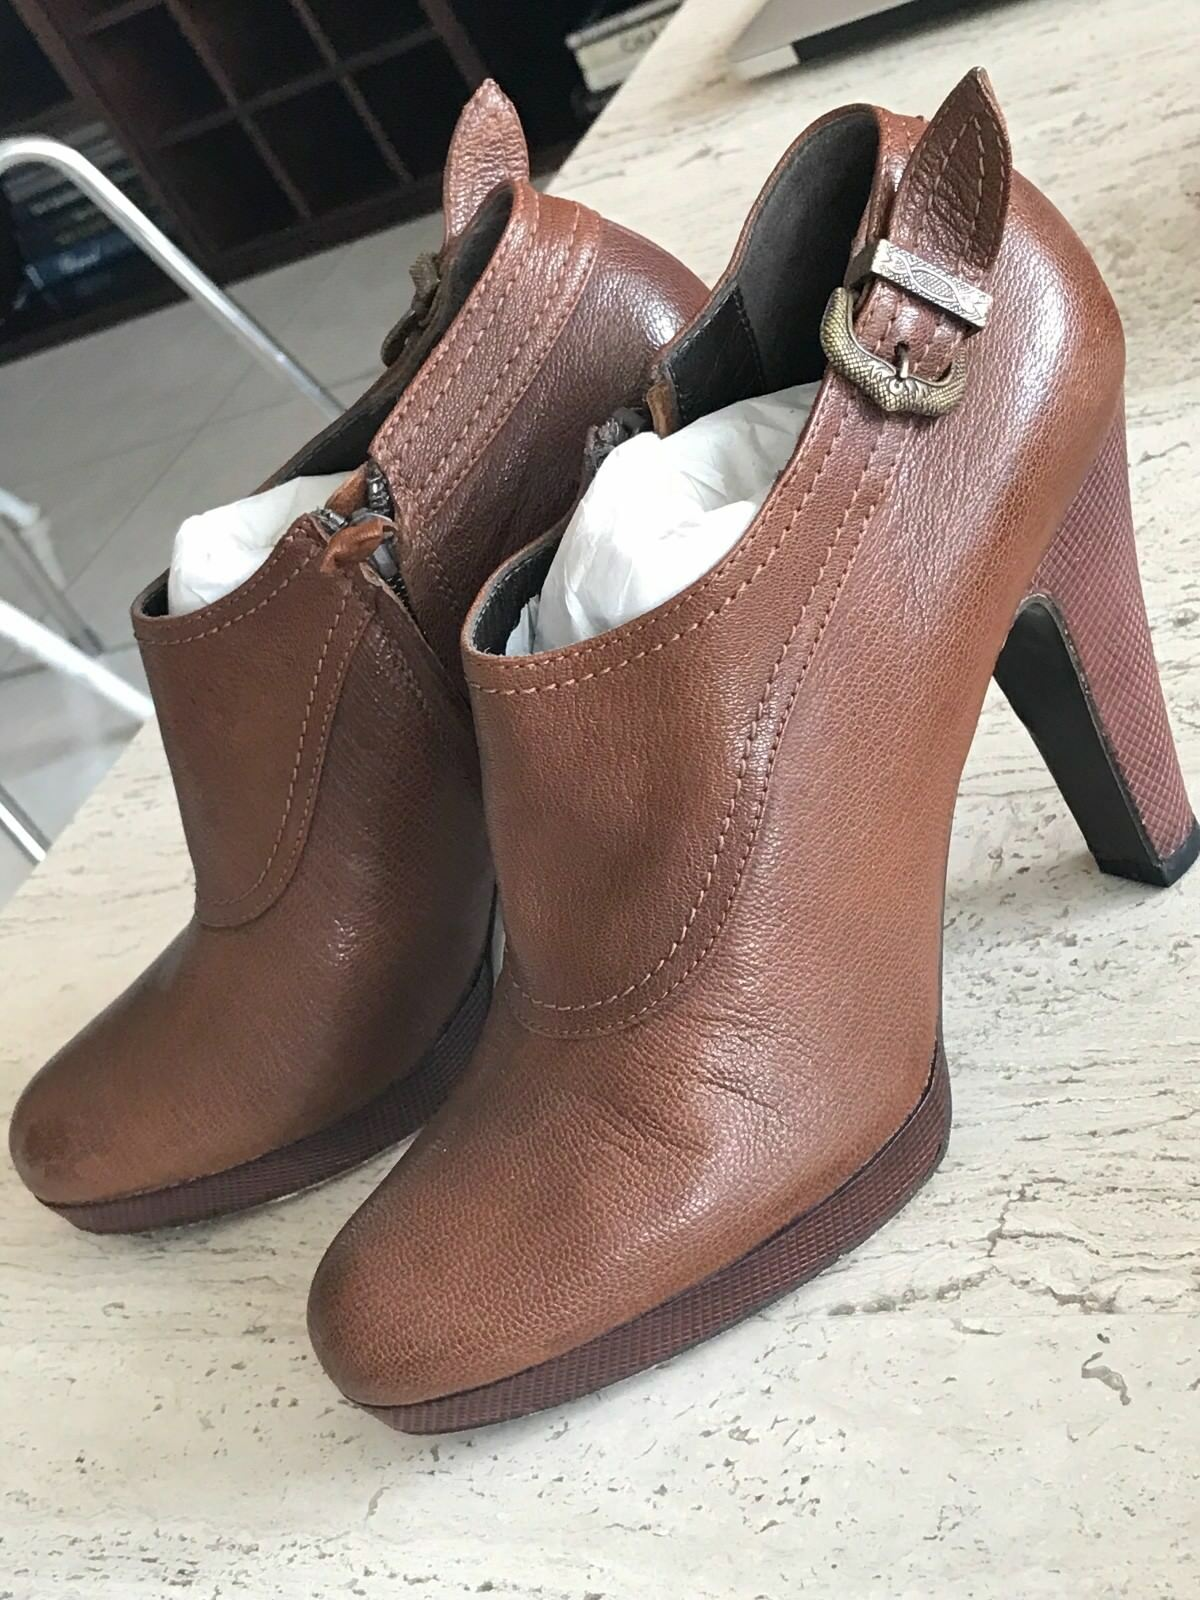 Elie Tahari Leather Charlotte Ankle Stiefel Style K72AU20U Größe 9 Cognac